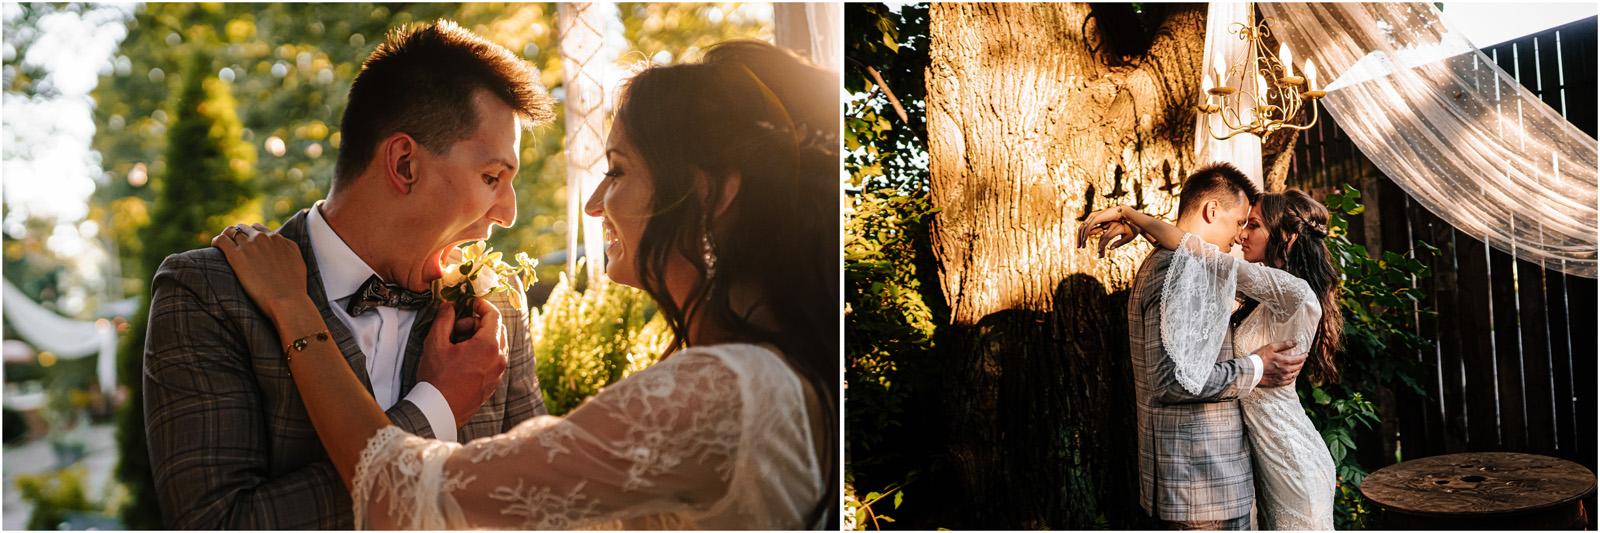 Ania & Mateusz | boho wesele w Stodole pod Kasztanami 94